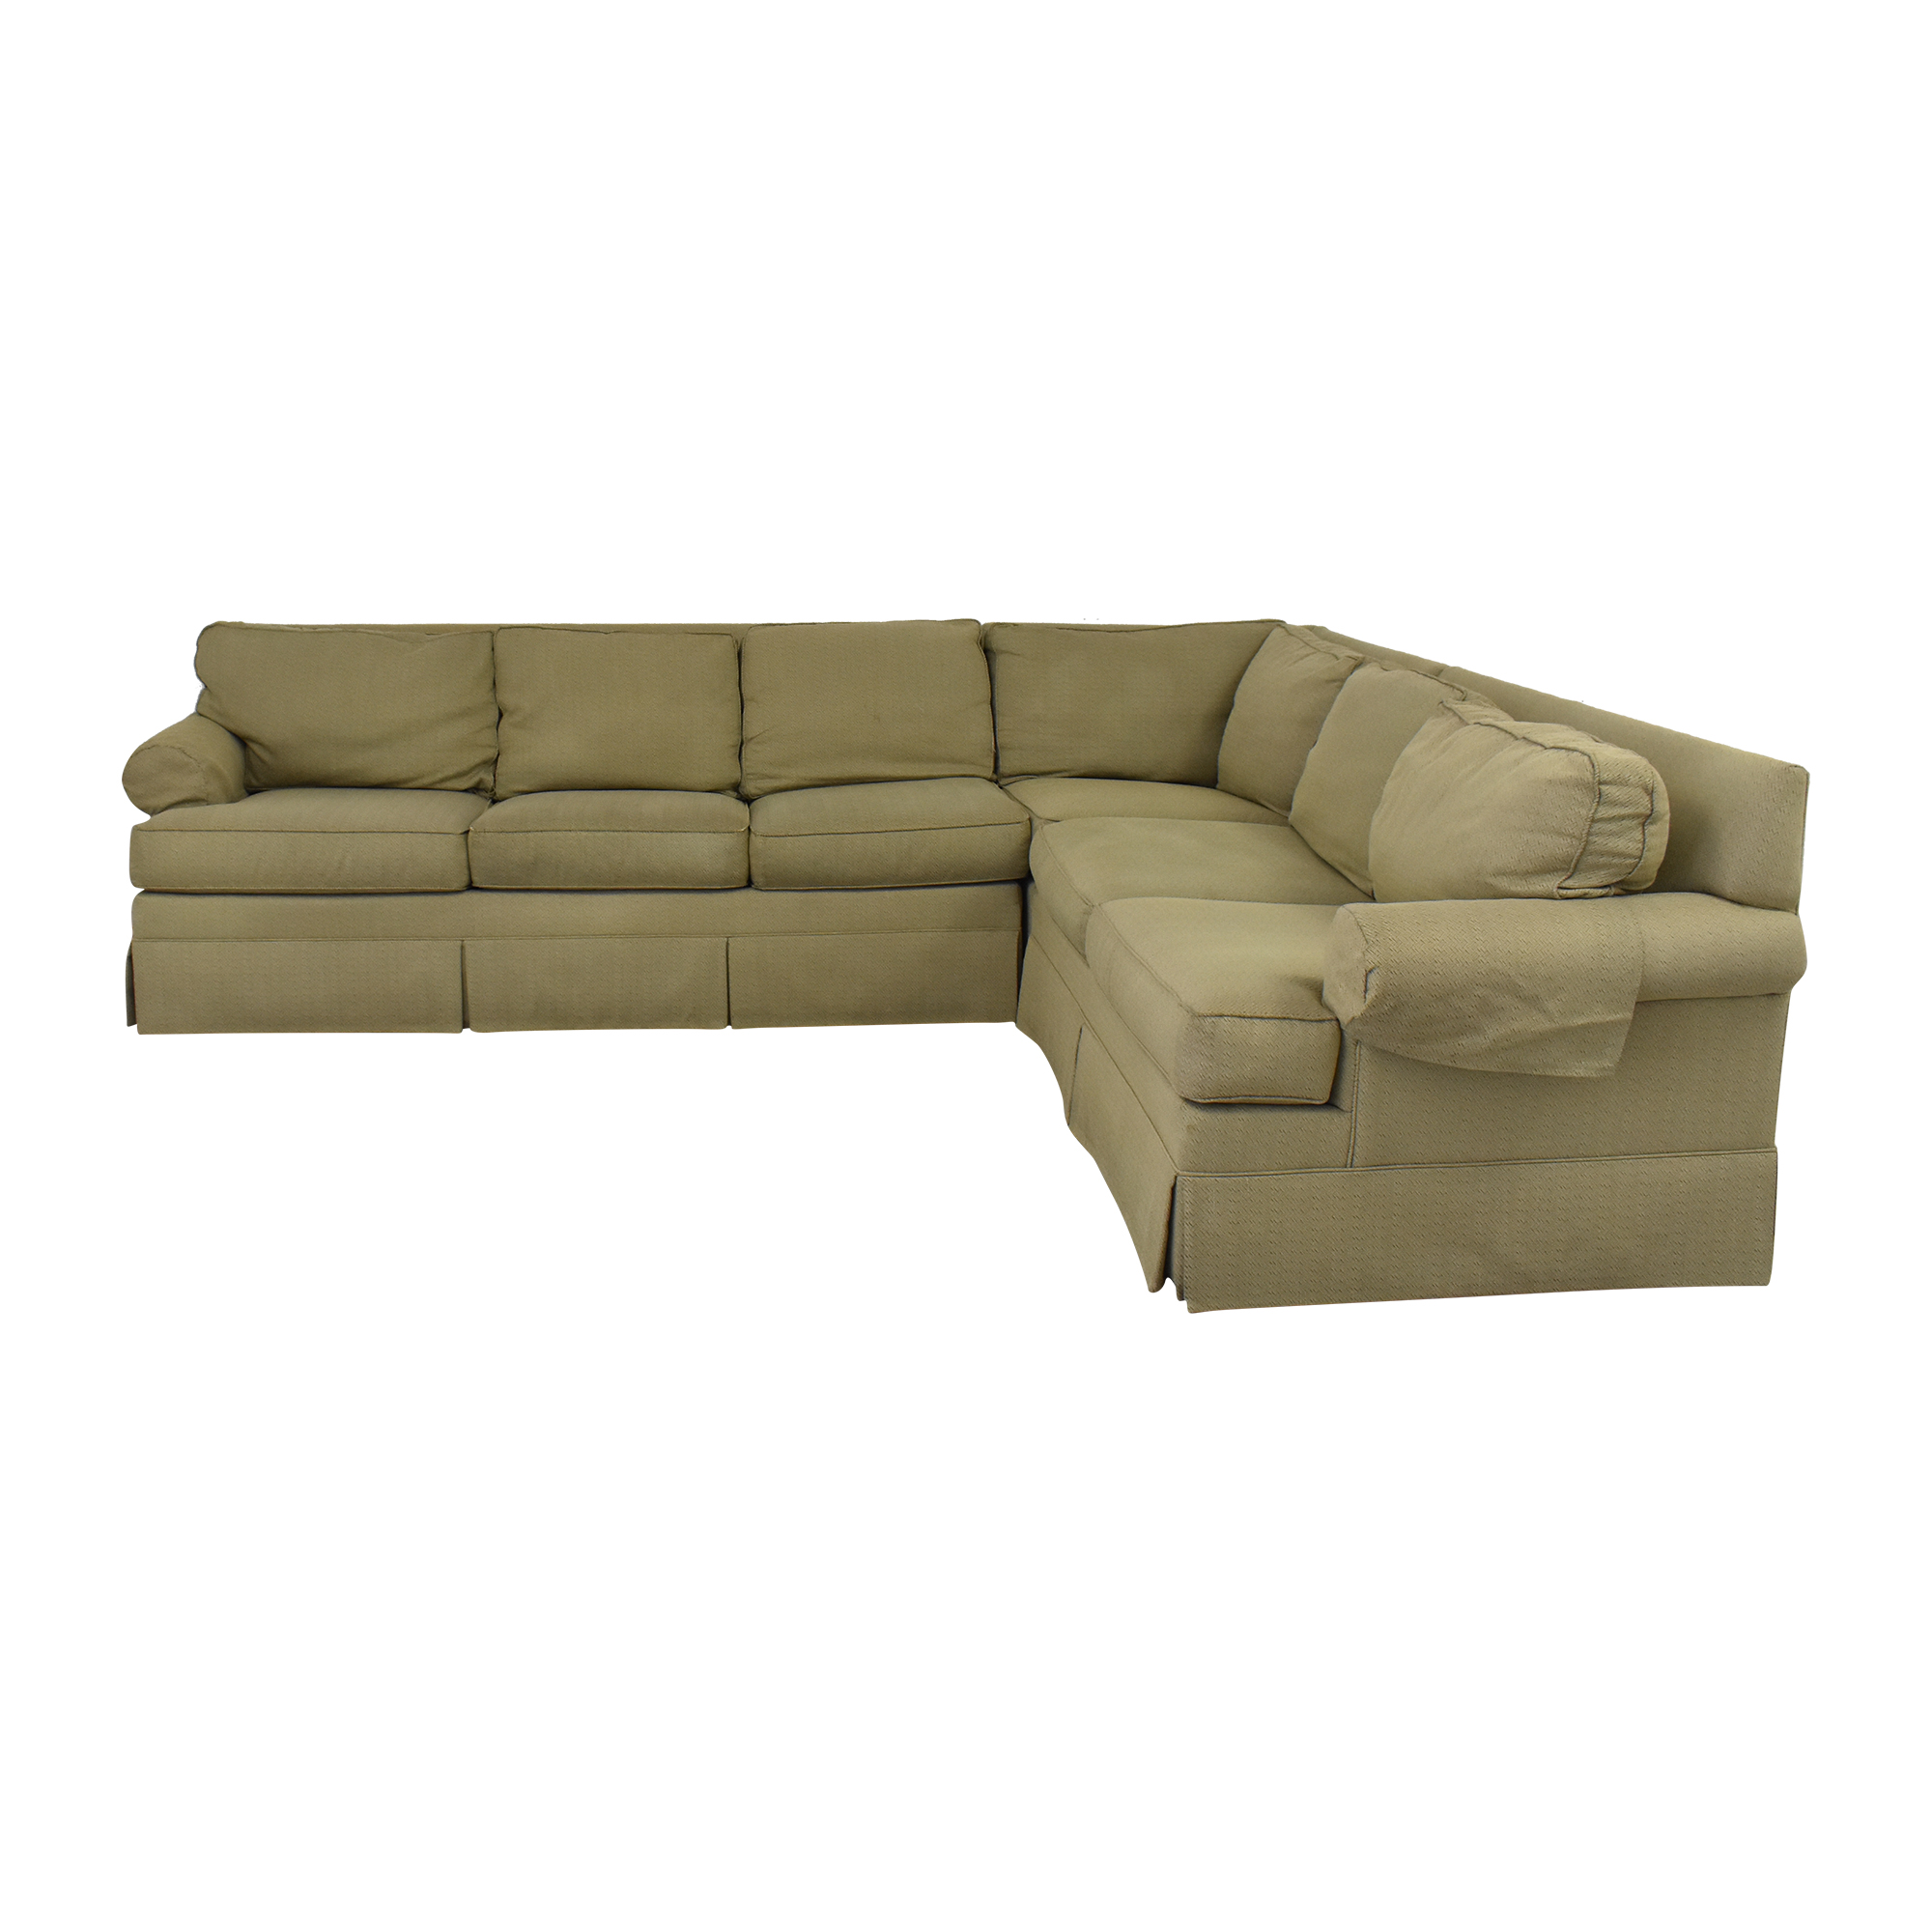 Ethan Allen Ethan Allan Skirted Sectional Sofa ma